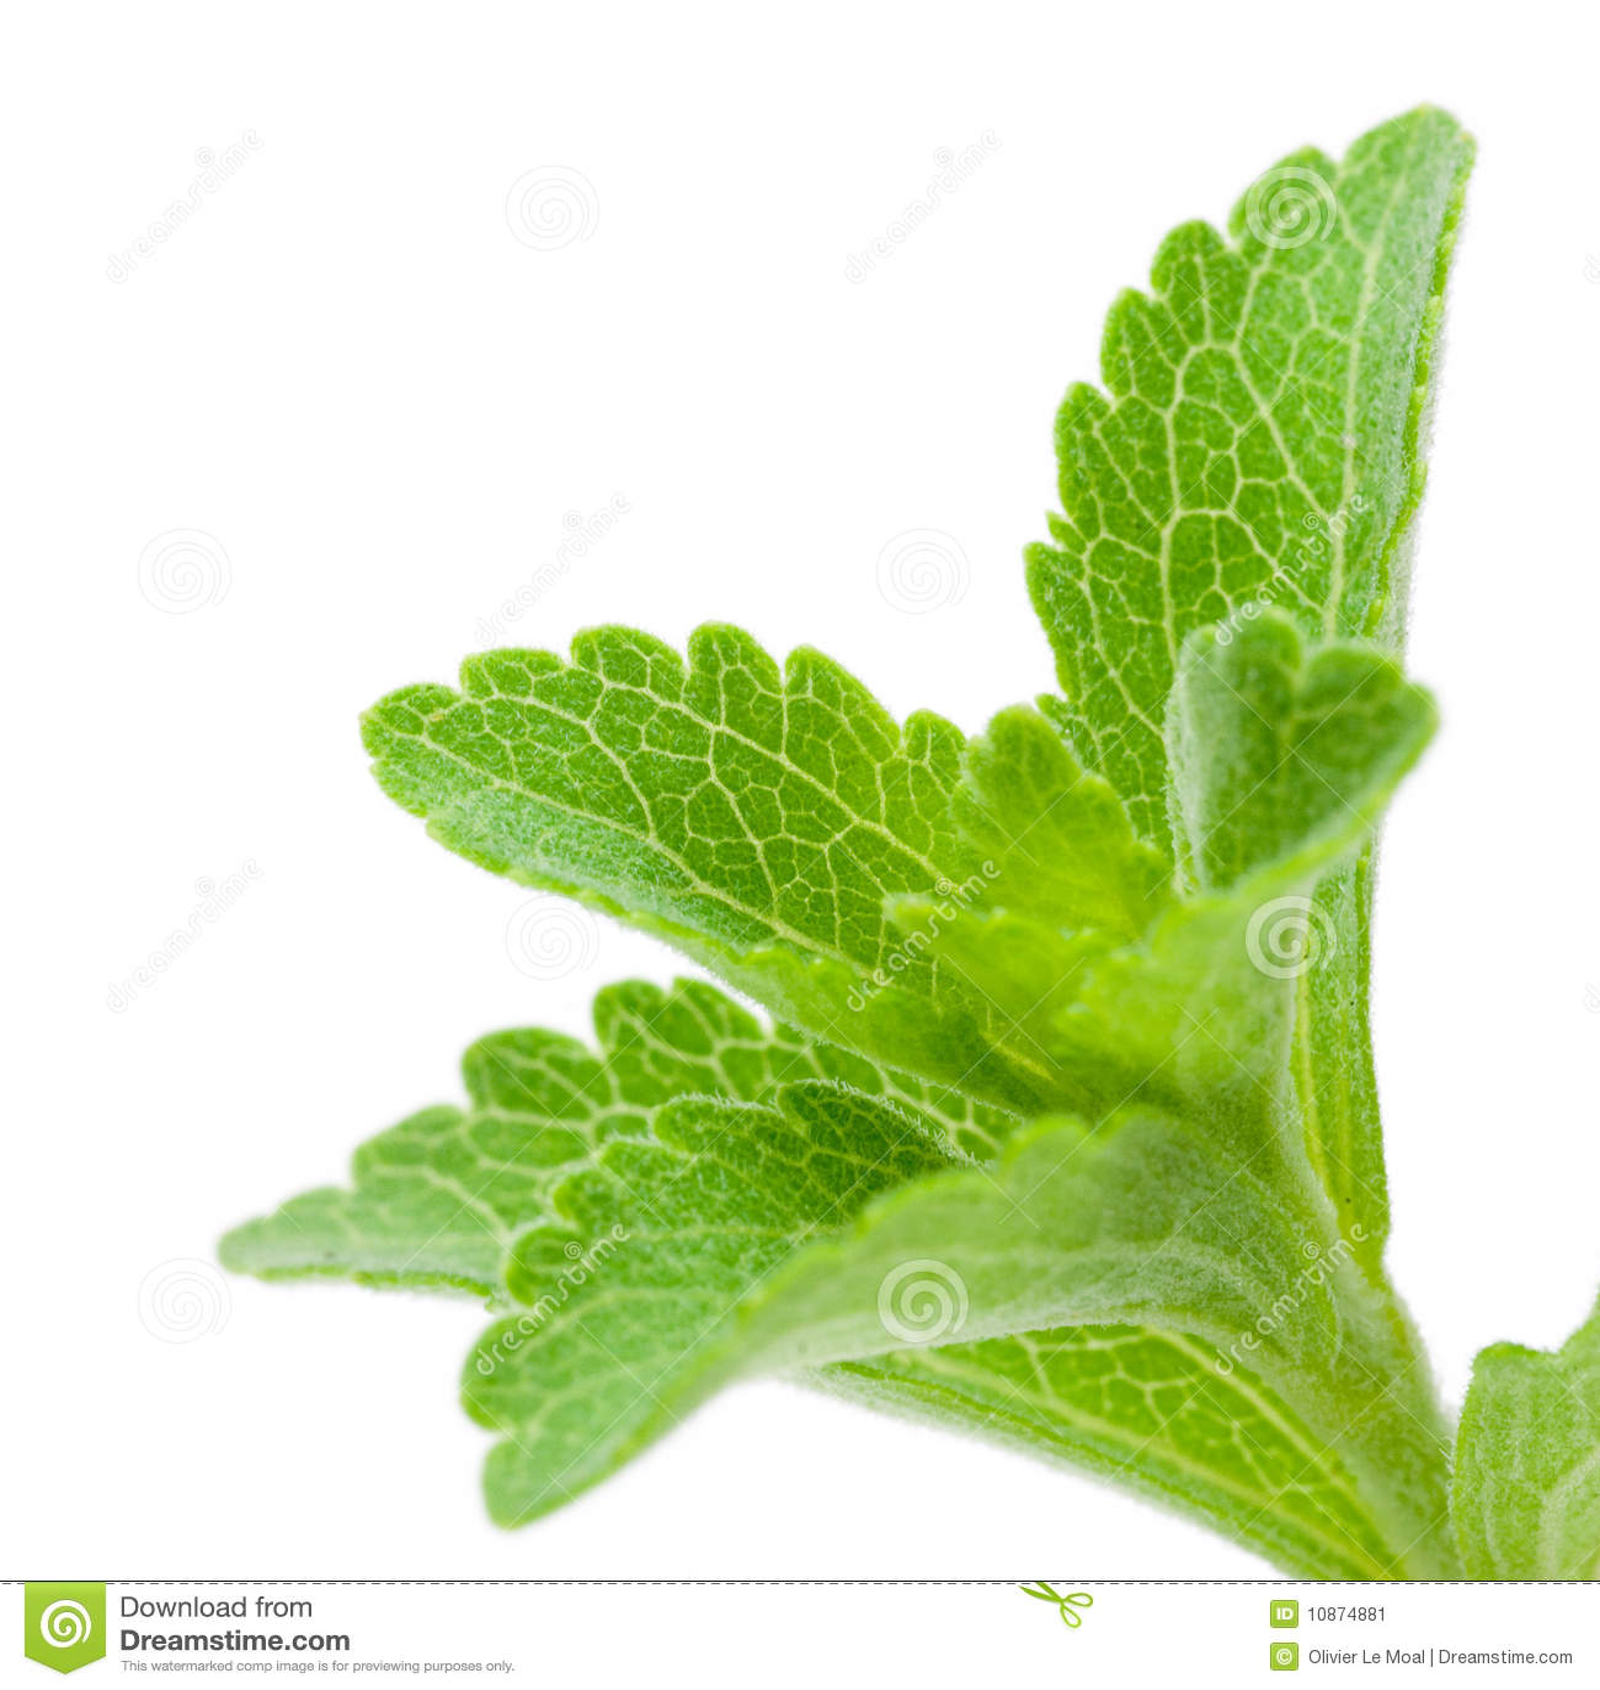 image of stevia rebaudiana stock image image 10874881. Black Bedroom Furniture Sets. Home Design Ideas